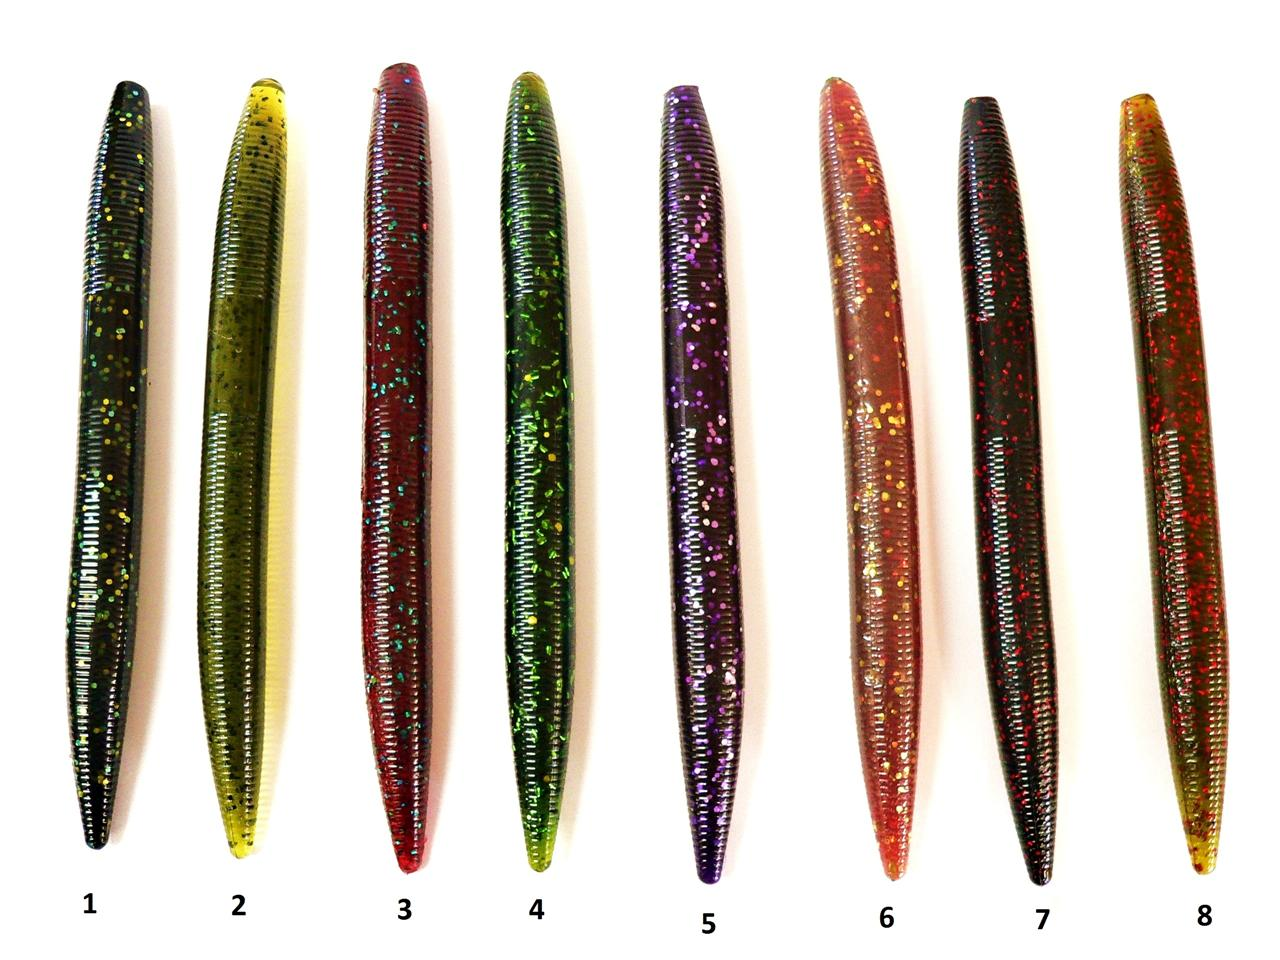 bogbaits 6 inch fat senko style stick baits stix lure bass